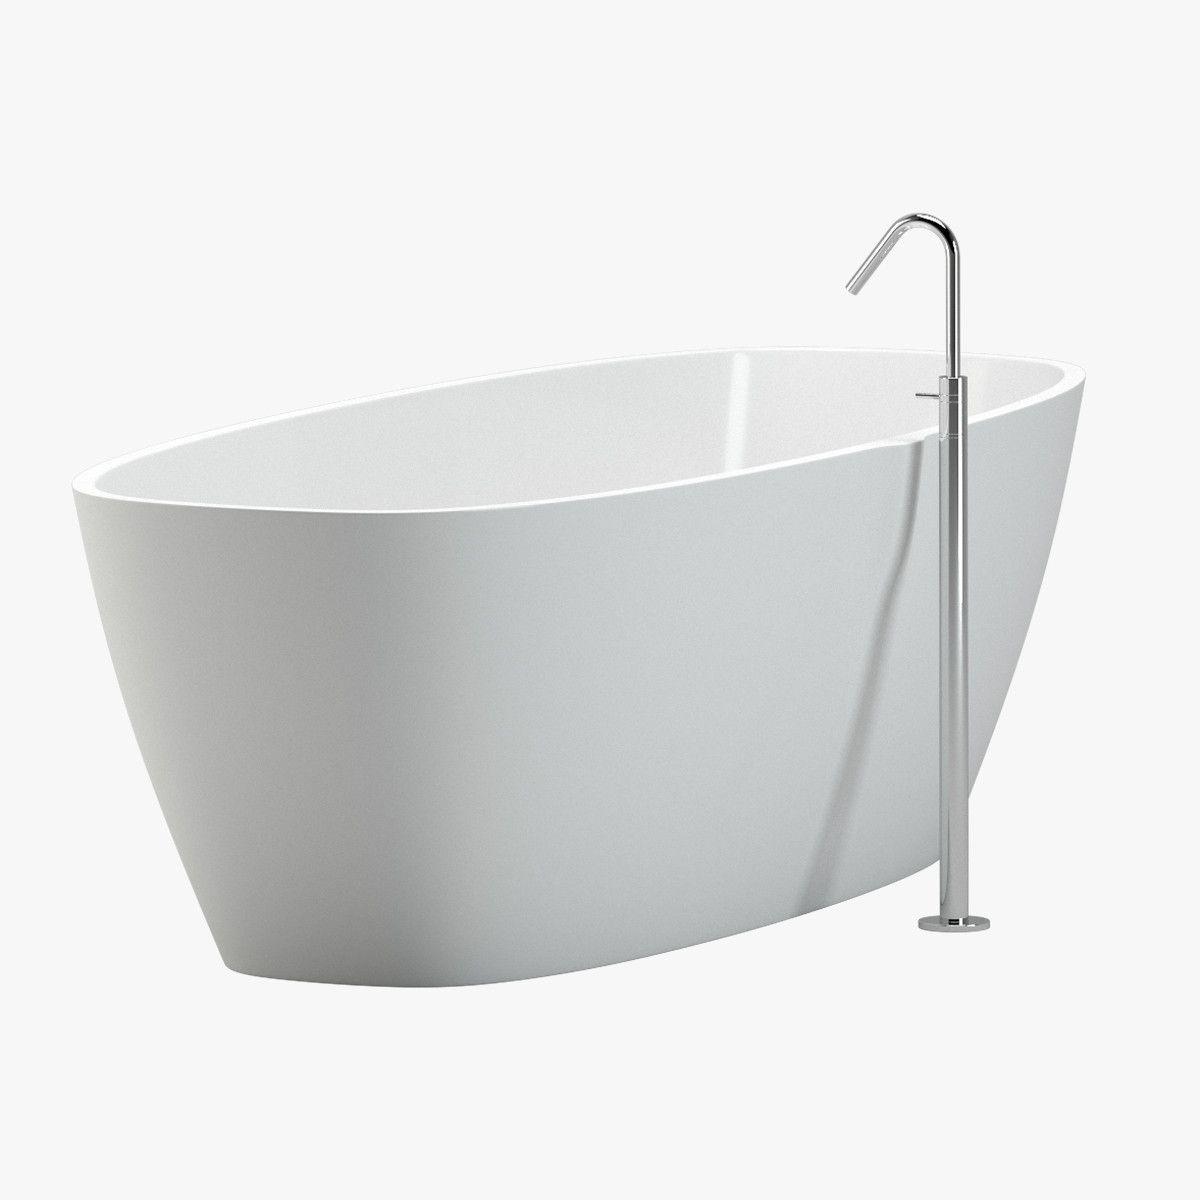 3D Bathtub 02 Faucet Model - 3D Model | 3D-Modeling | Pinterest ...